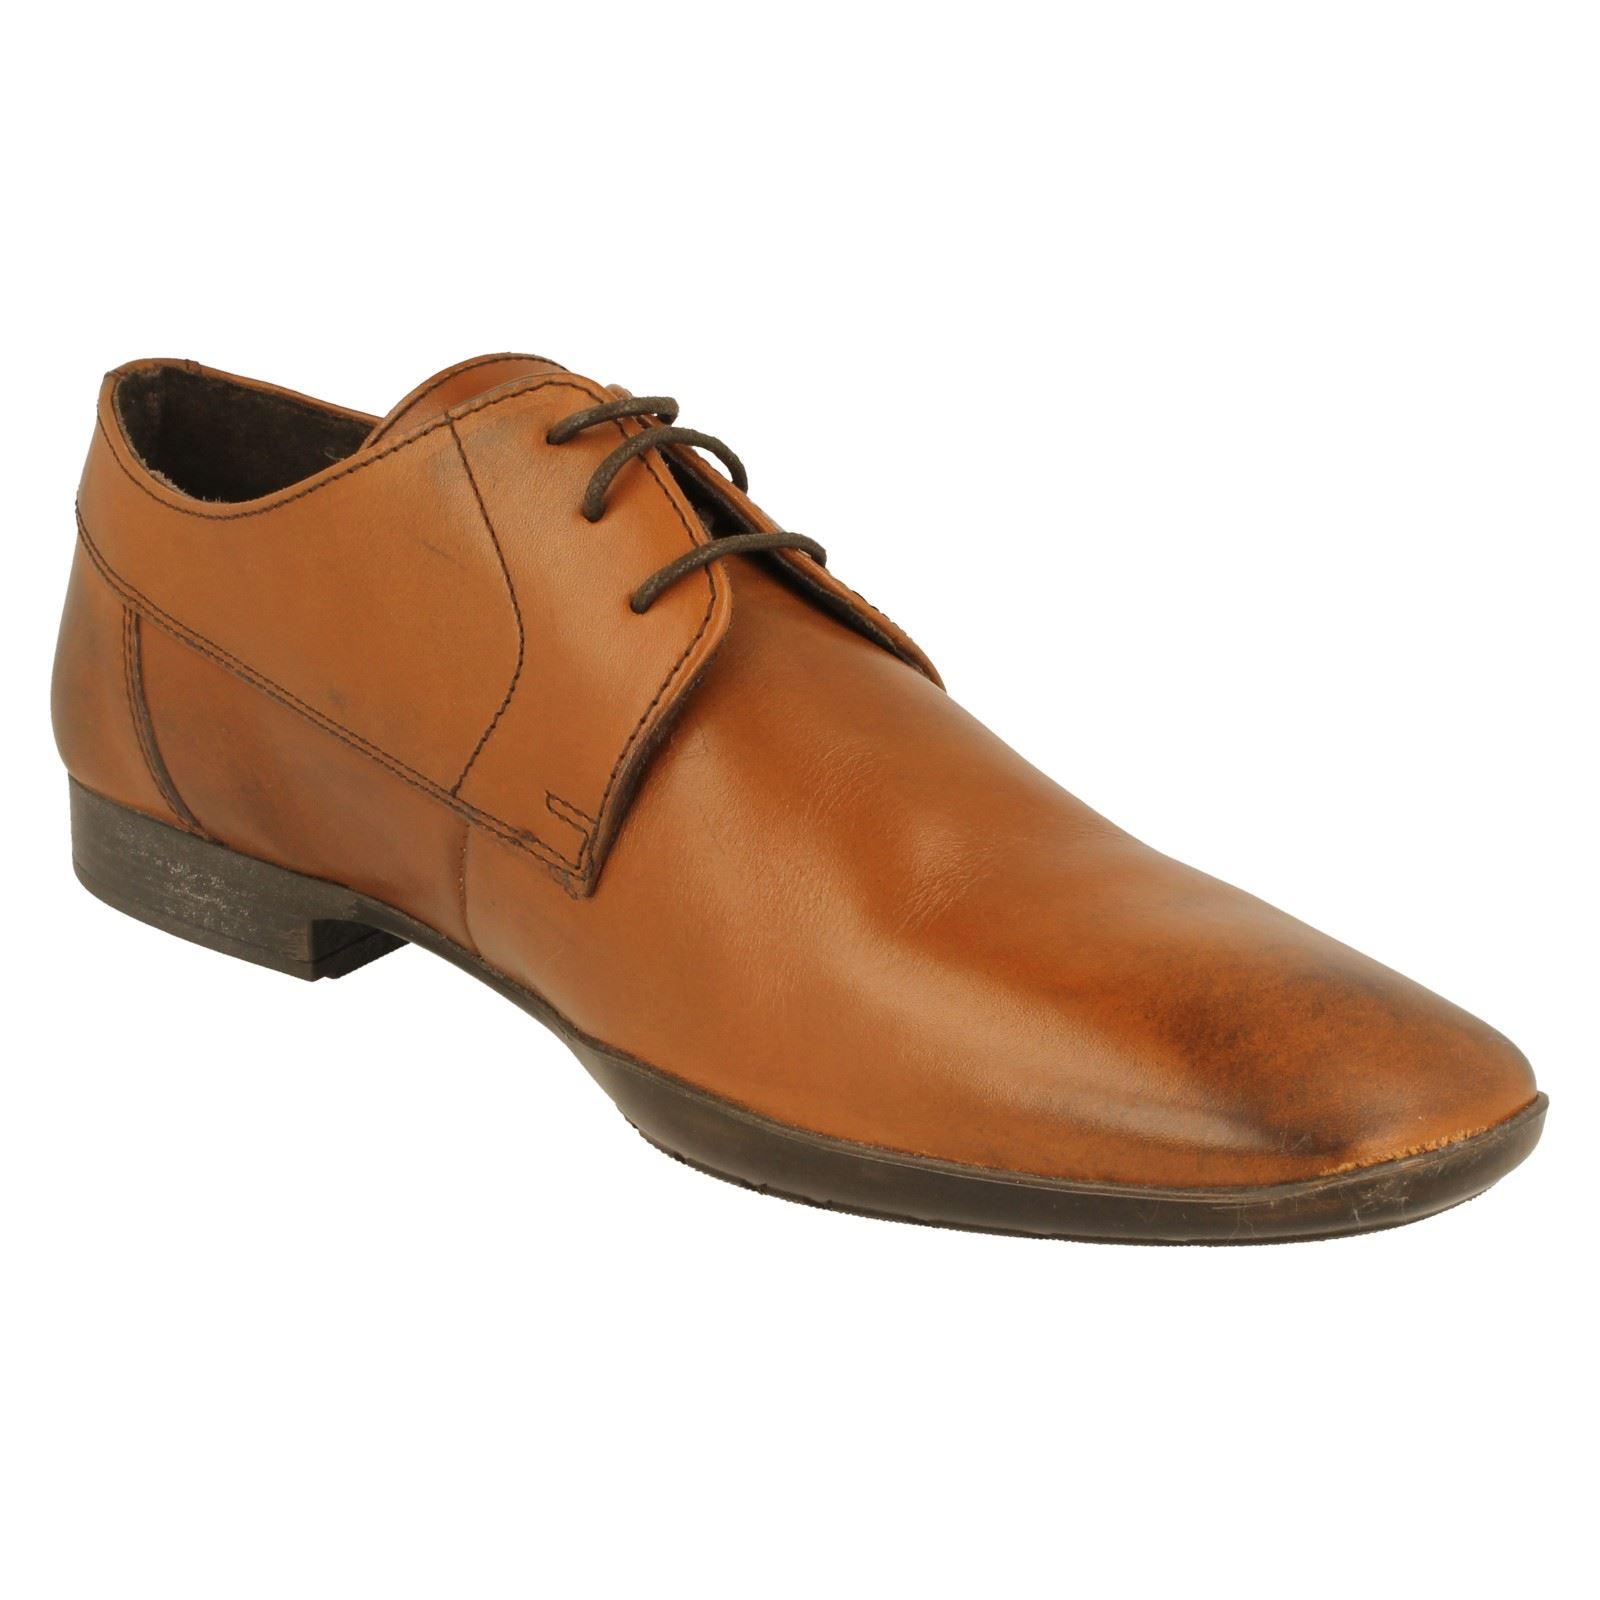 Herren London Base London Herren Schuhes Style Libra -w 6bf5a3